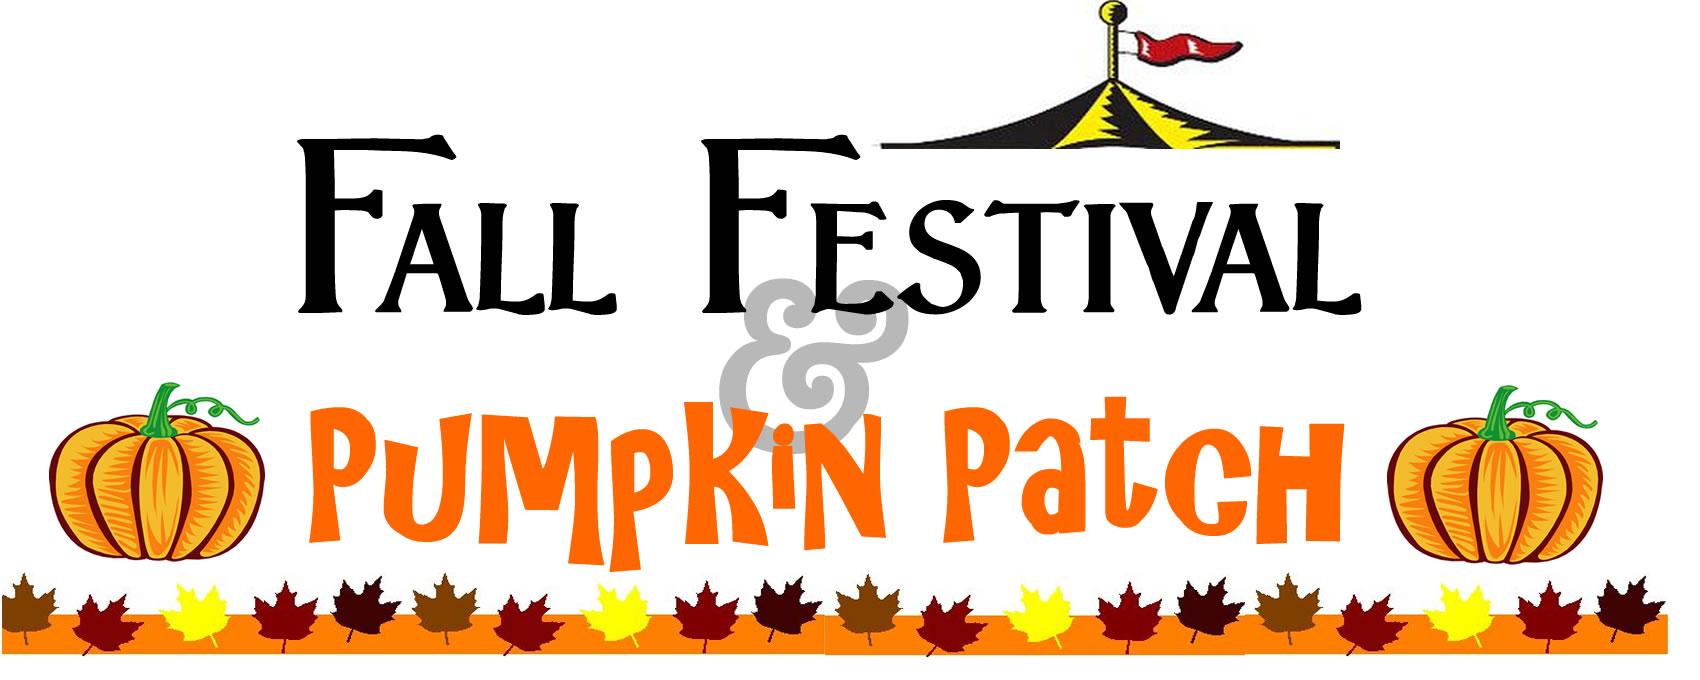 Fall Festival Border Clip Art